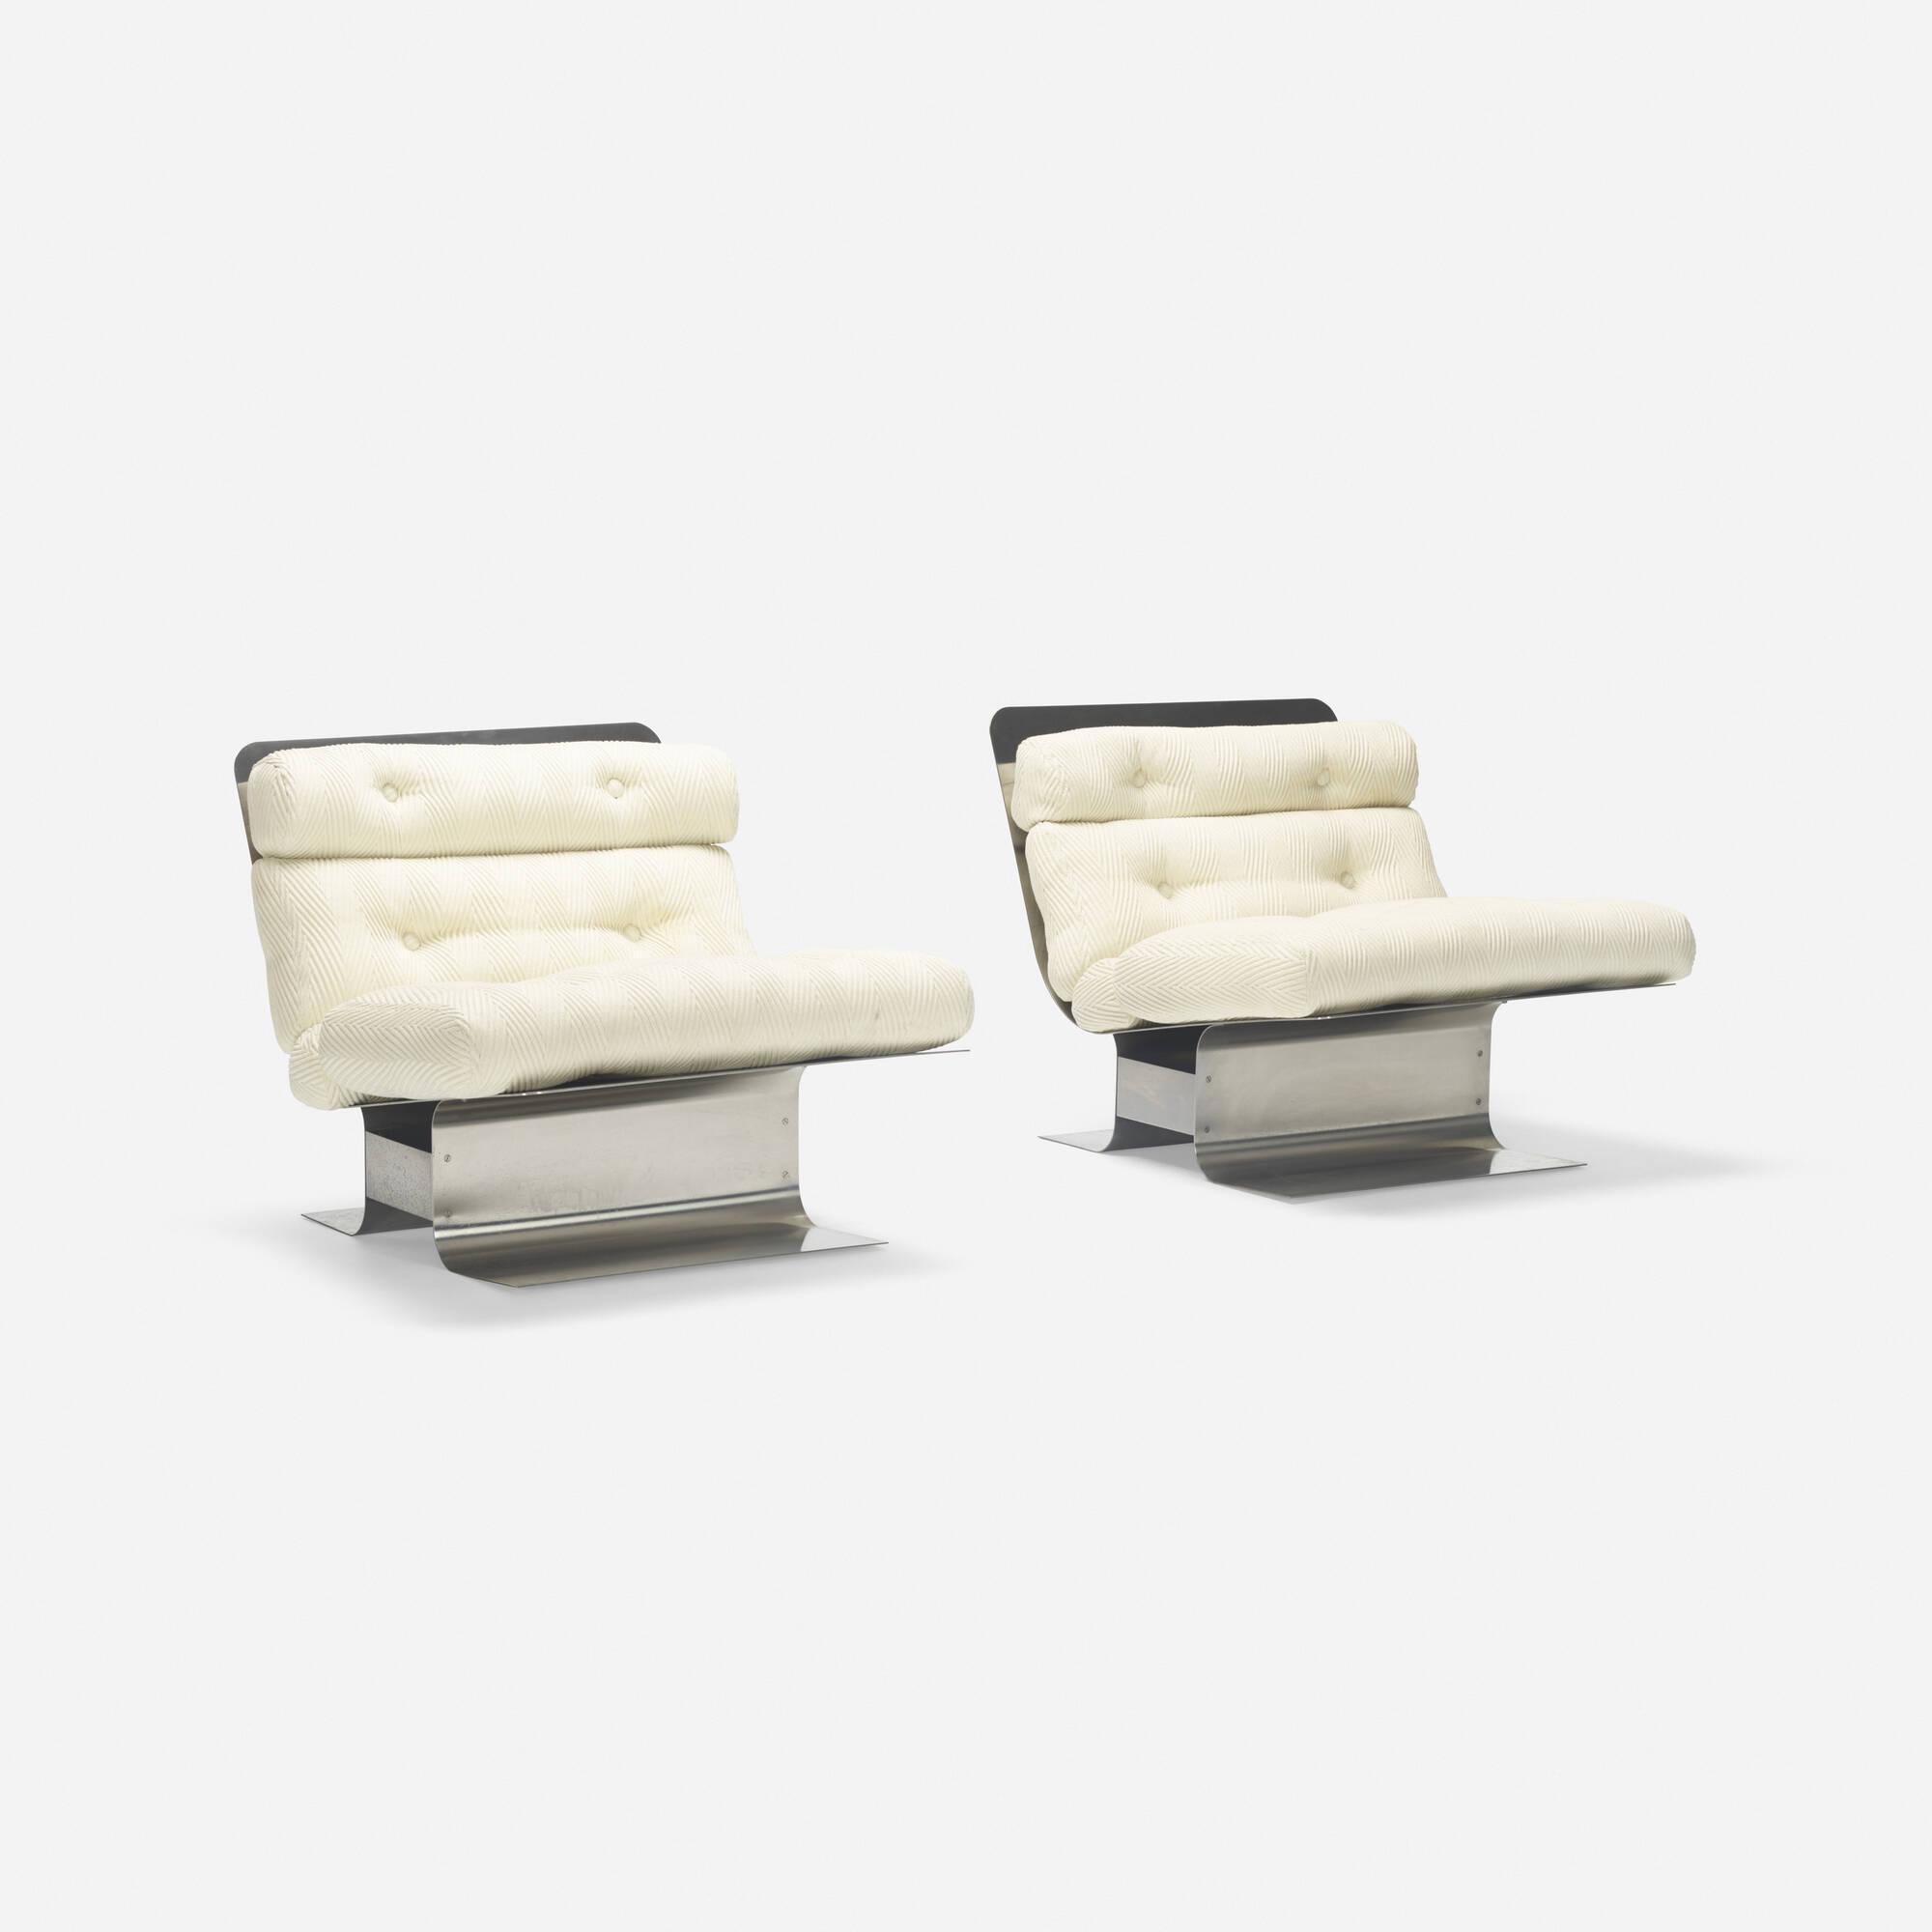 326: François Monnet / lounge chairs, pair (1 of 3)